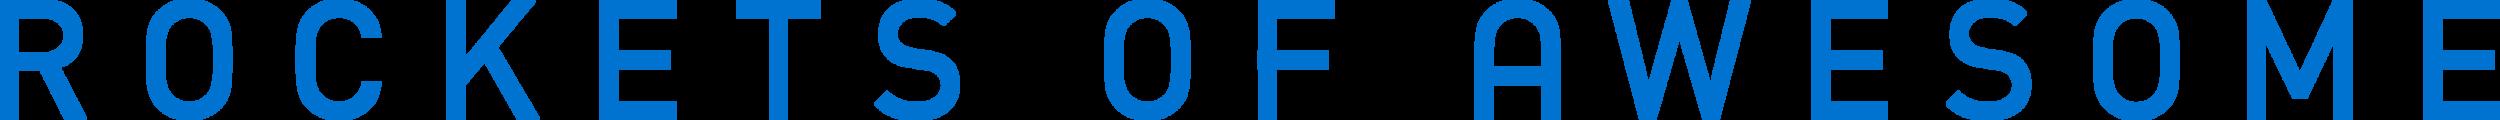 FINAL Logotype_RocketBlue_Large.png